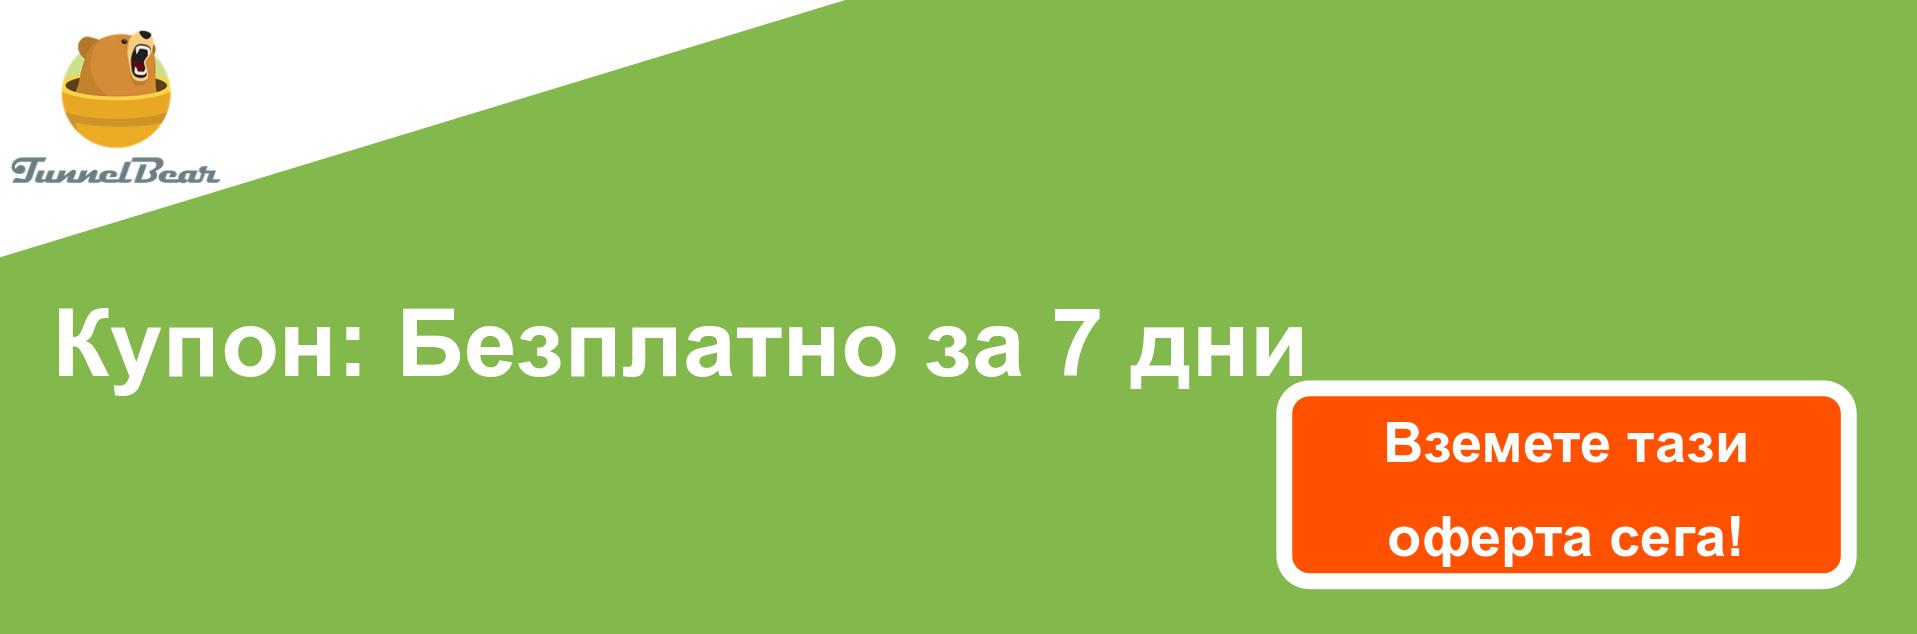 TunnelBear VPN банер за купони - 7 дни безплатно